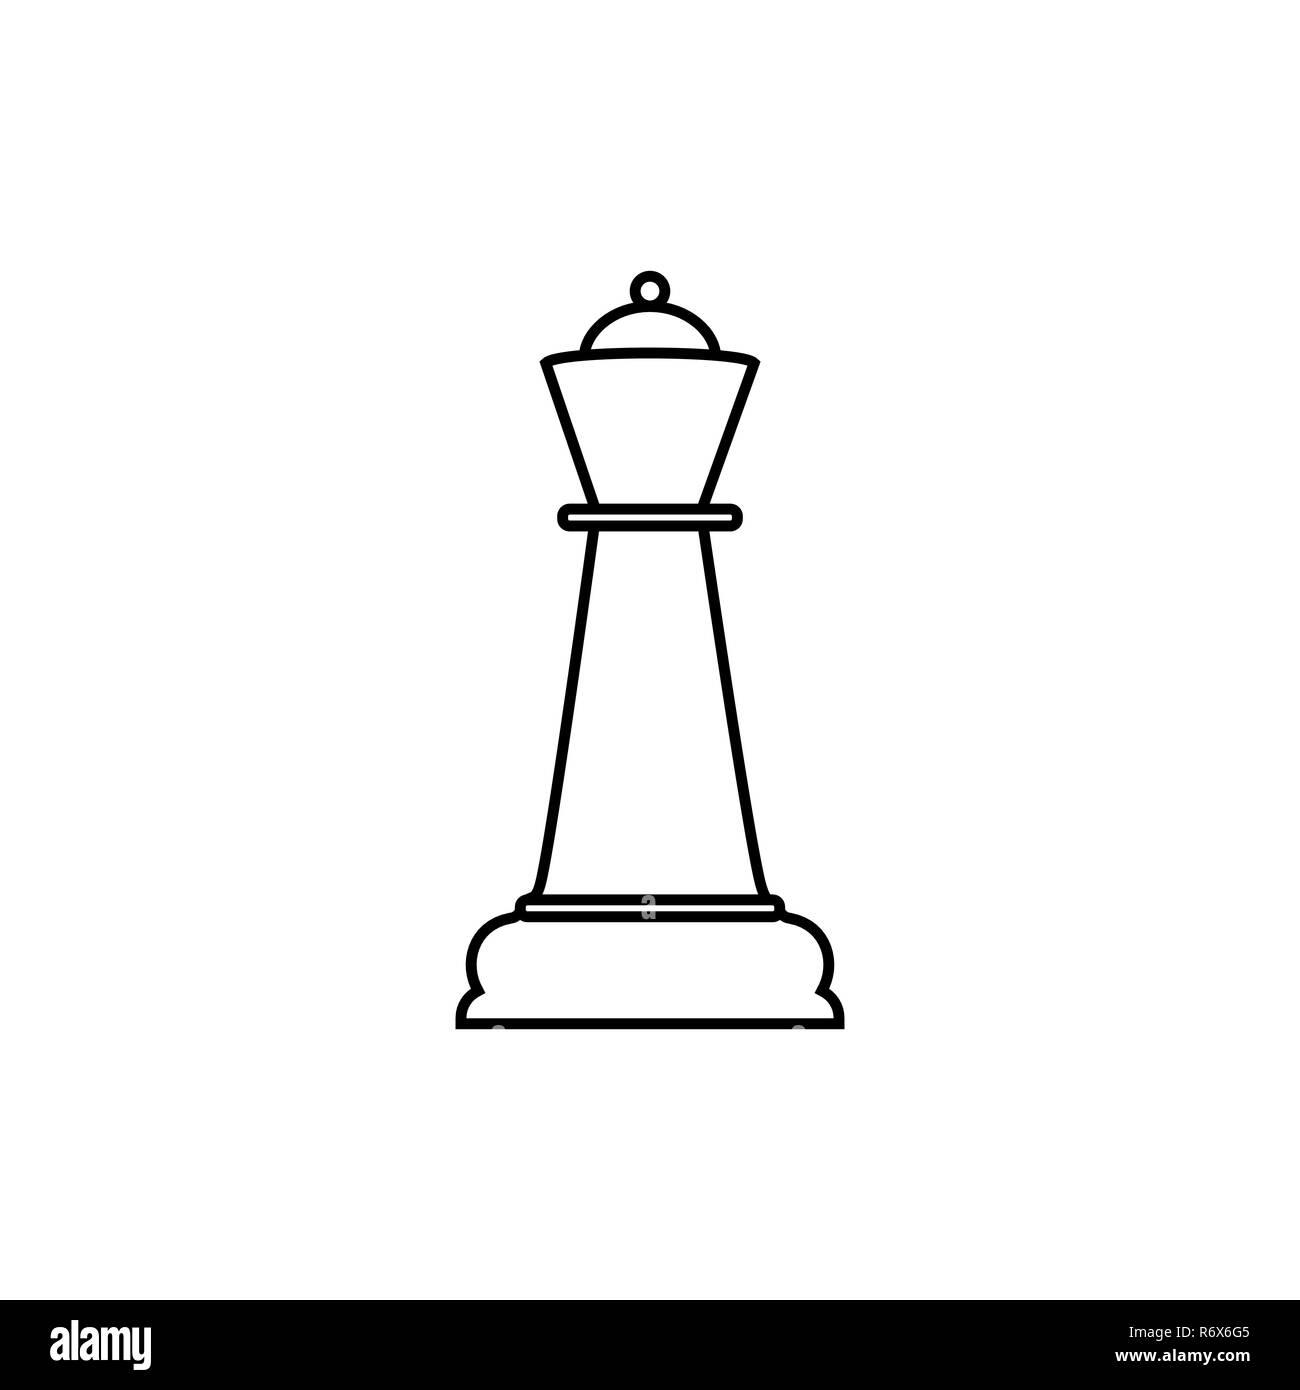 Quenn line chess icon. Vector illustration, flat design. Stock Vector